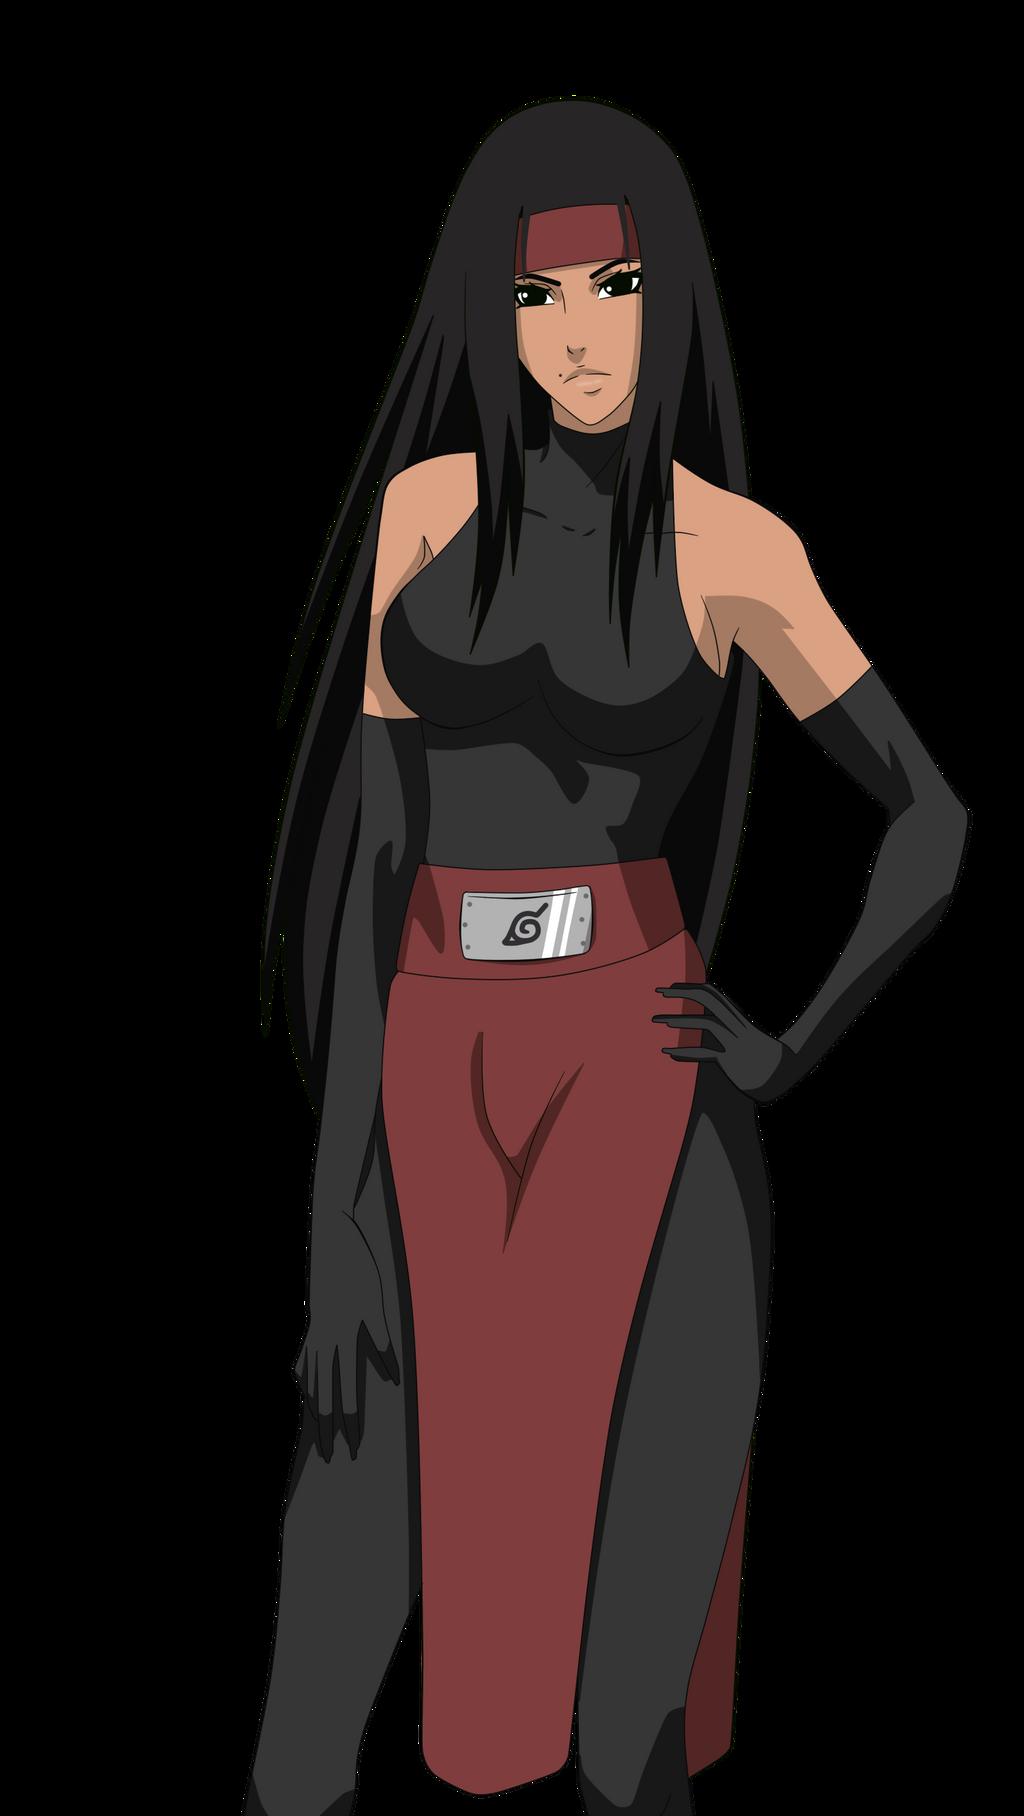 Fairy Tail Manga Naruto Oc Hitaomi Senju By Ohikosenju On Deviantart